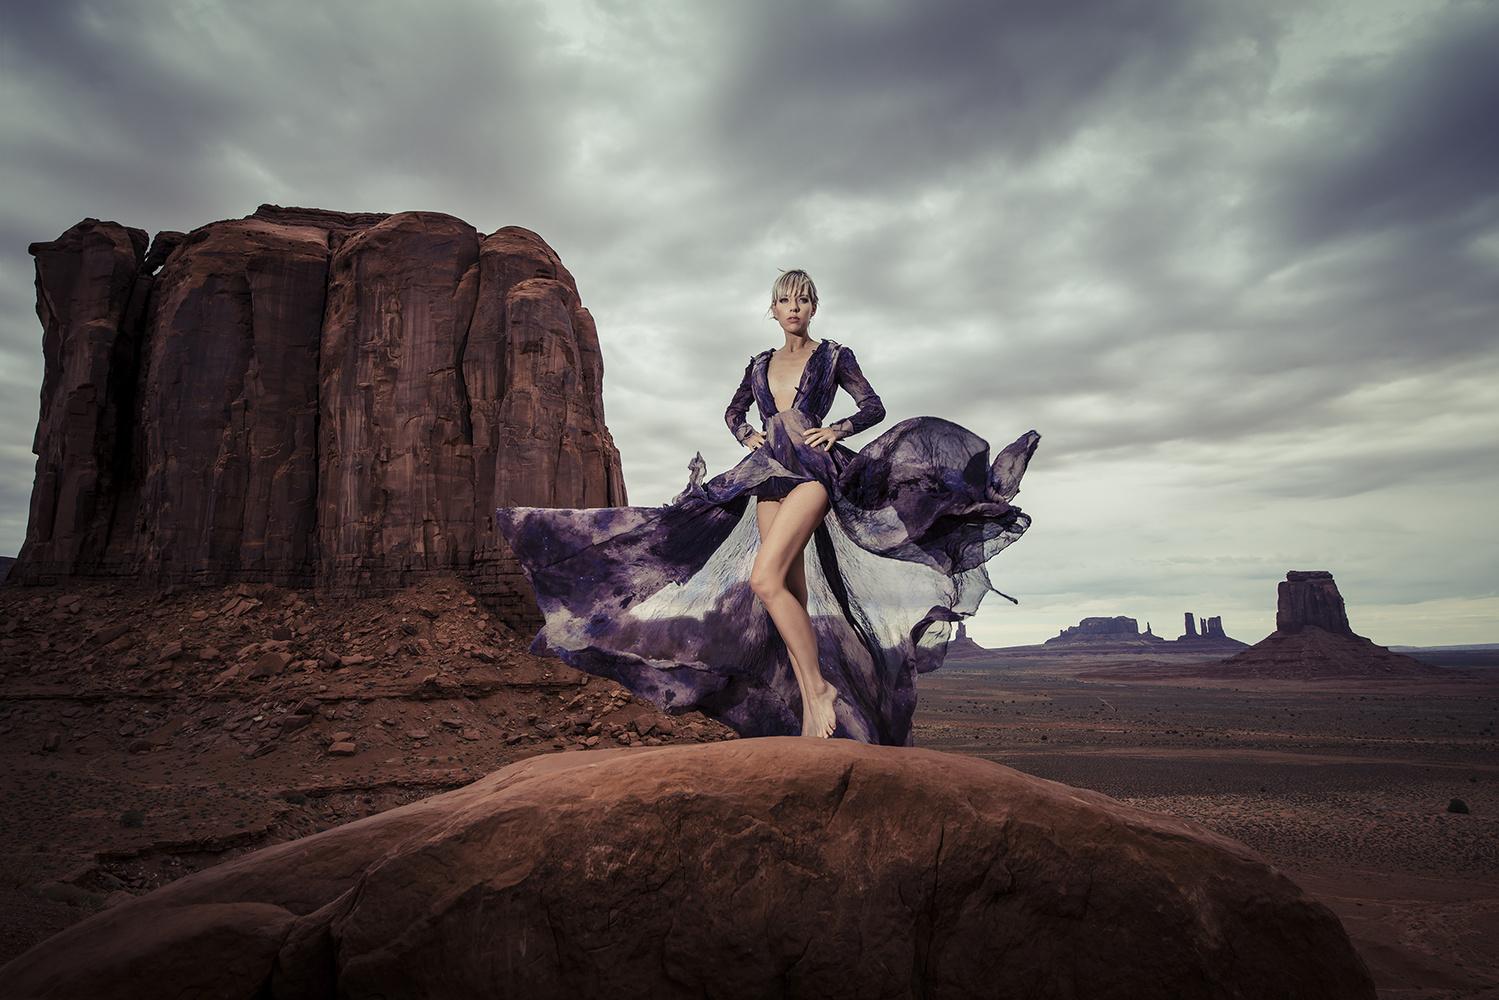 Wild Wide West by Marc lamey